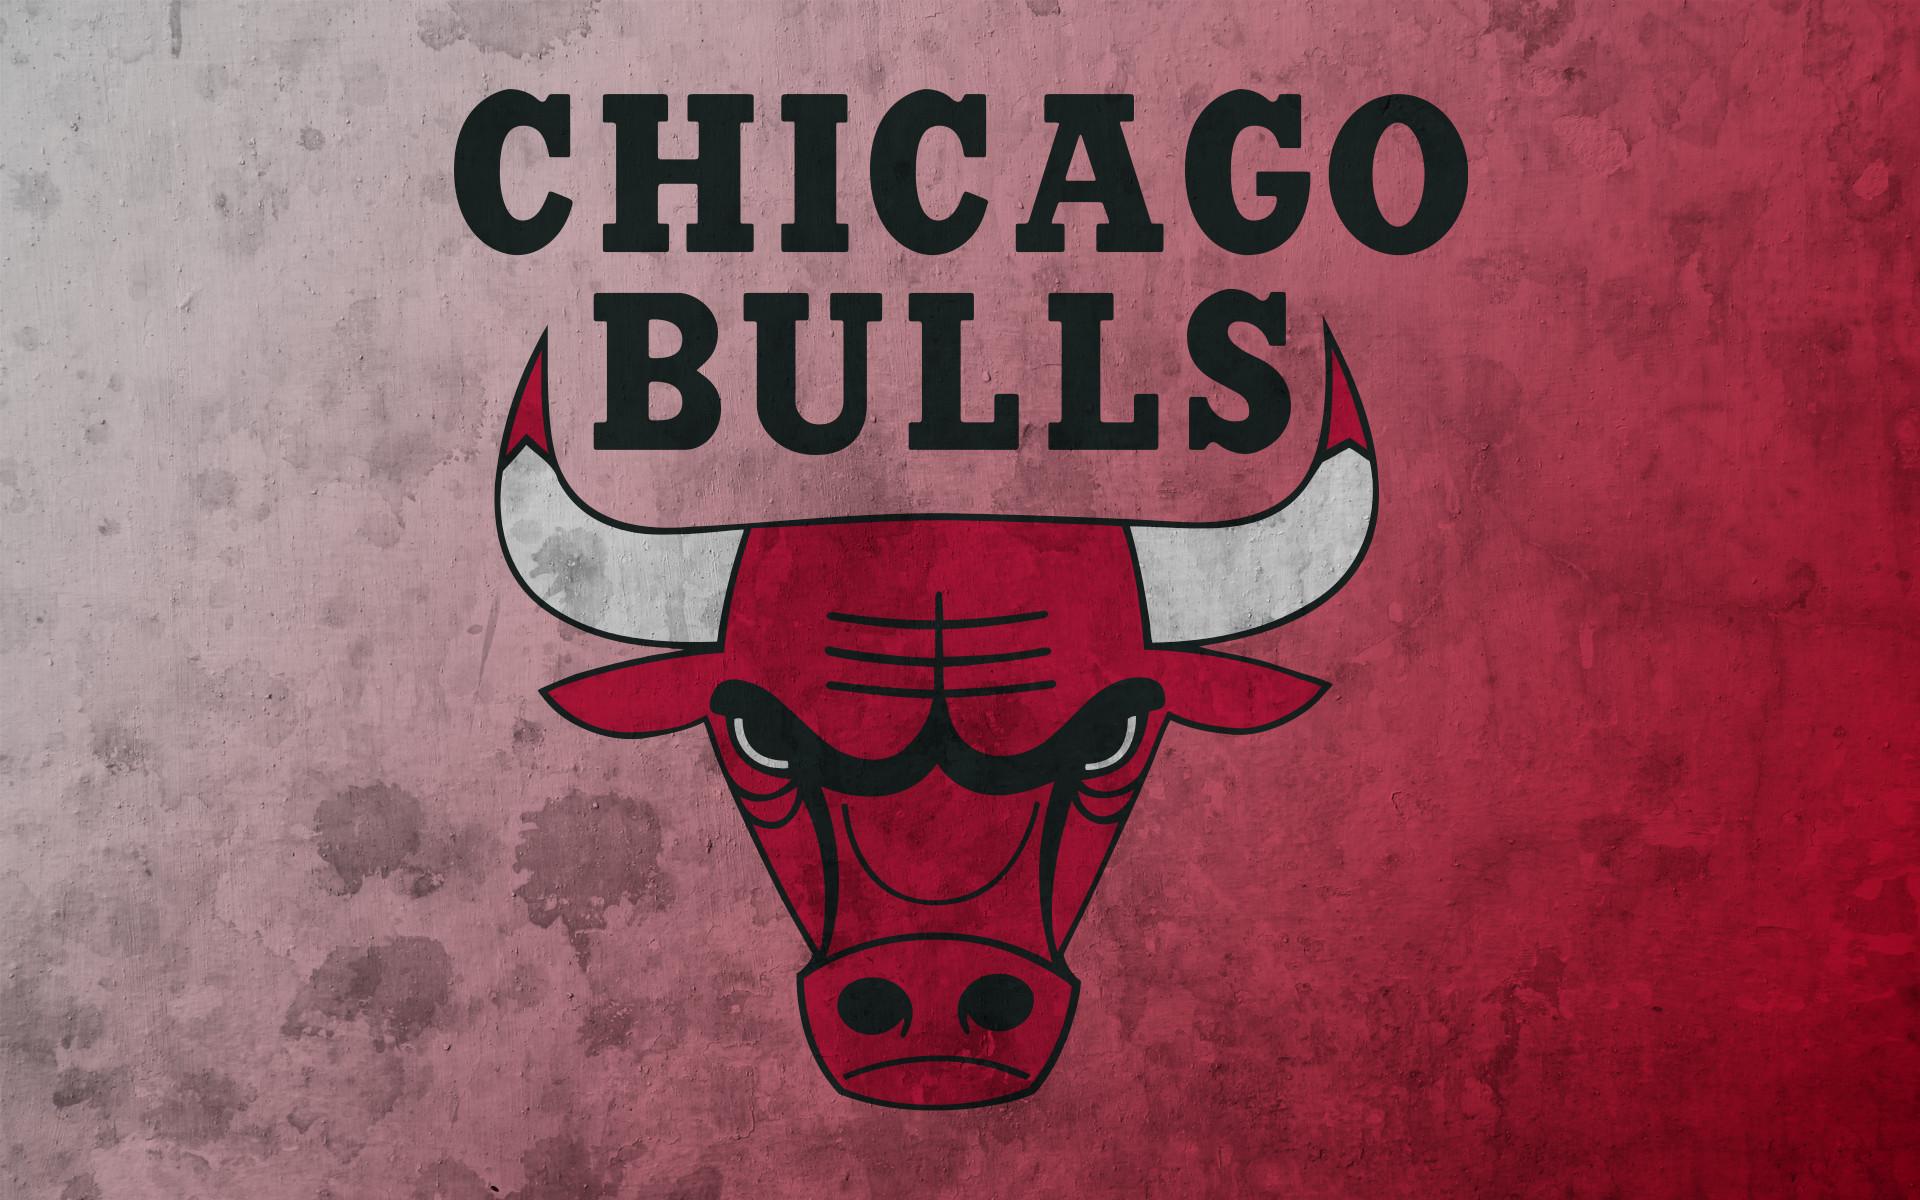 Chicago Bulls Wallpaper HD 2018 ·① WallpaperTag